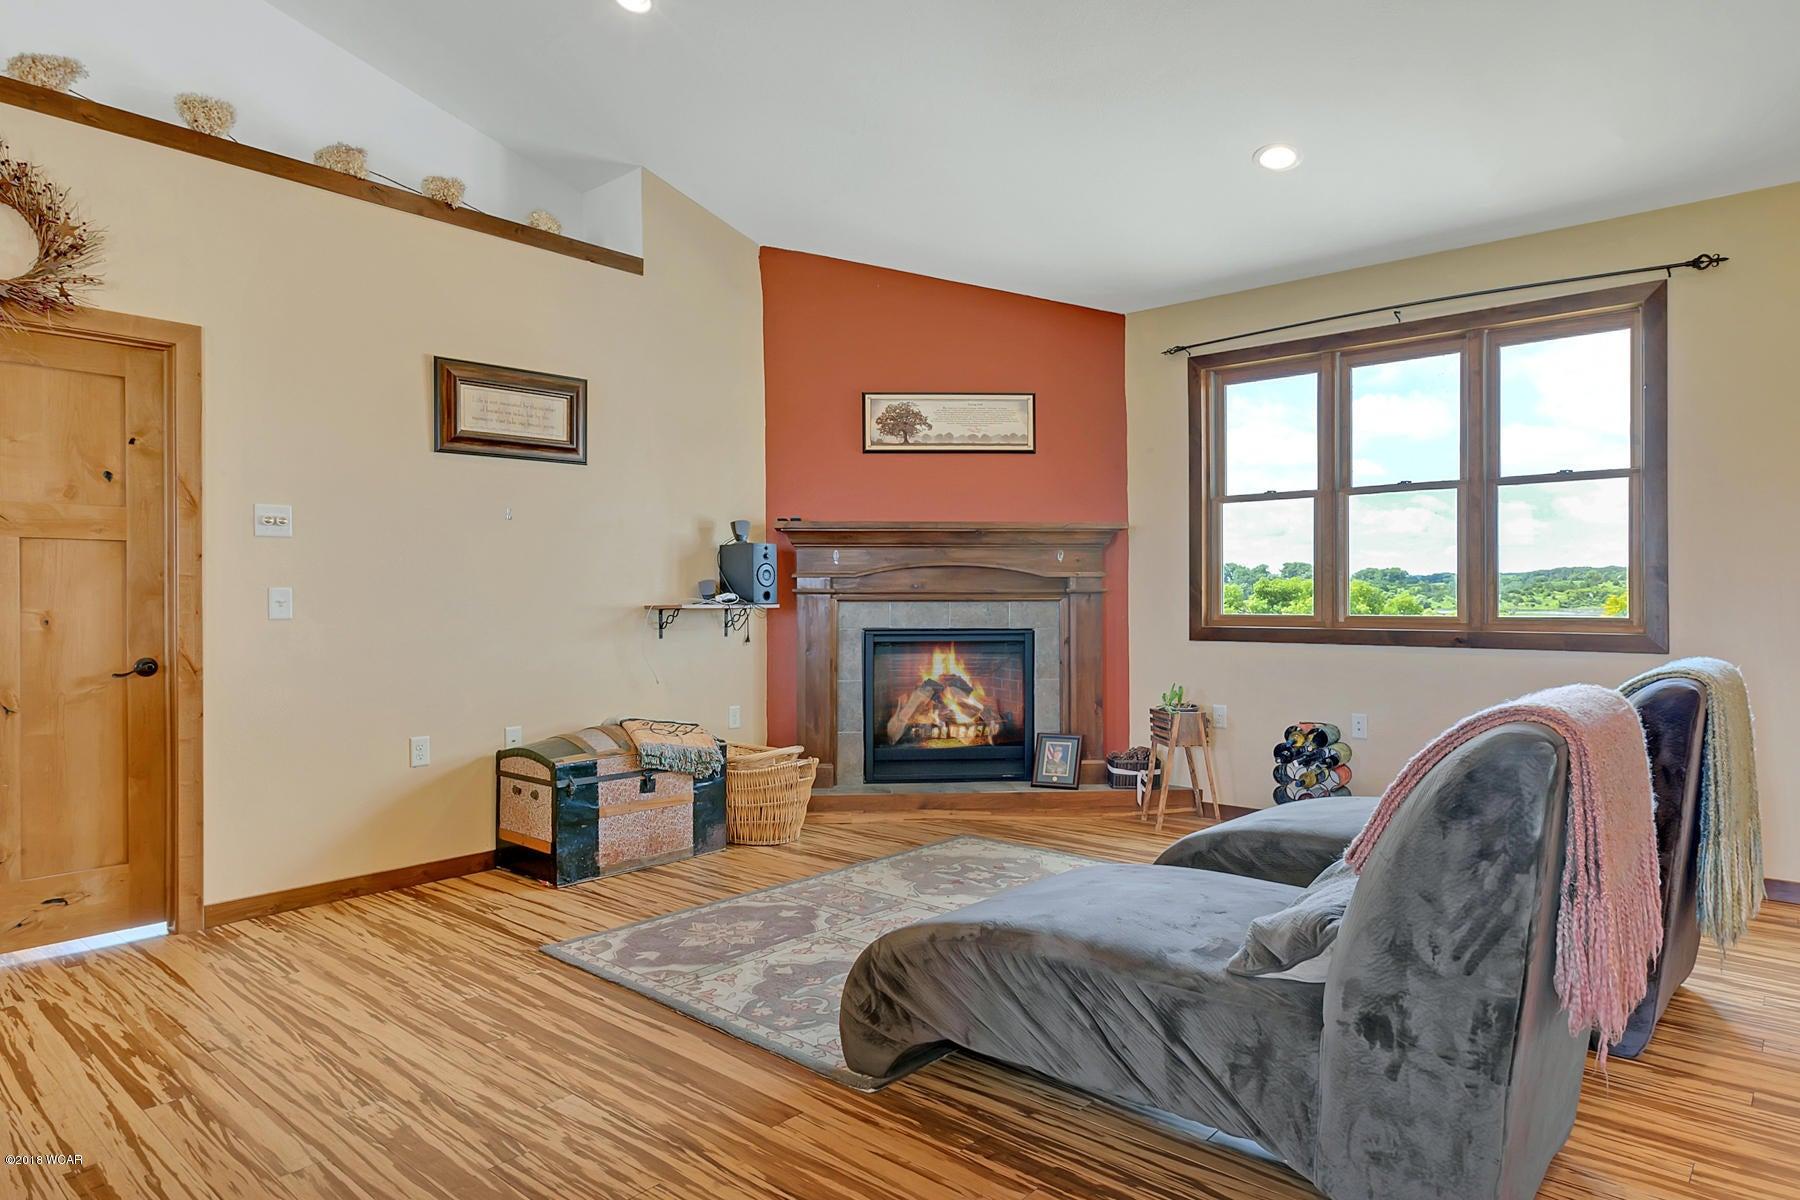 16312 7th Street,New London,4 Bedrooms Bedrooms,3 BathroomsBathrooms,Single Family,7th Street,6031295